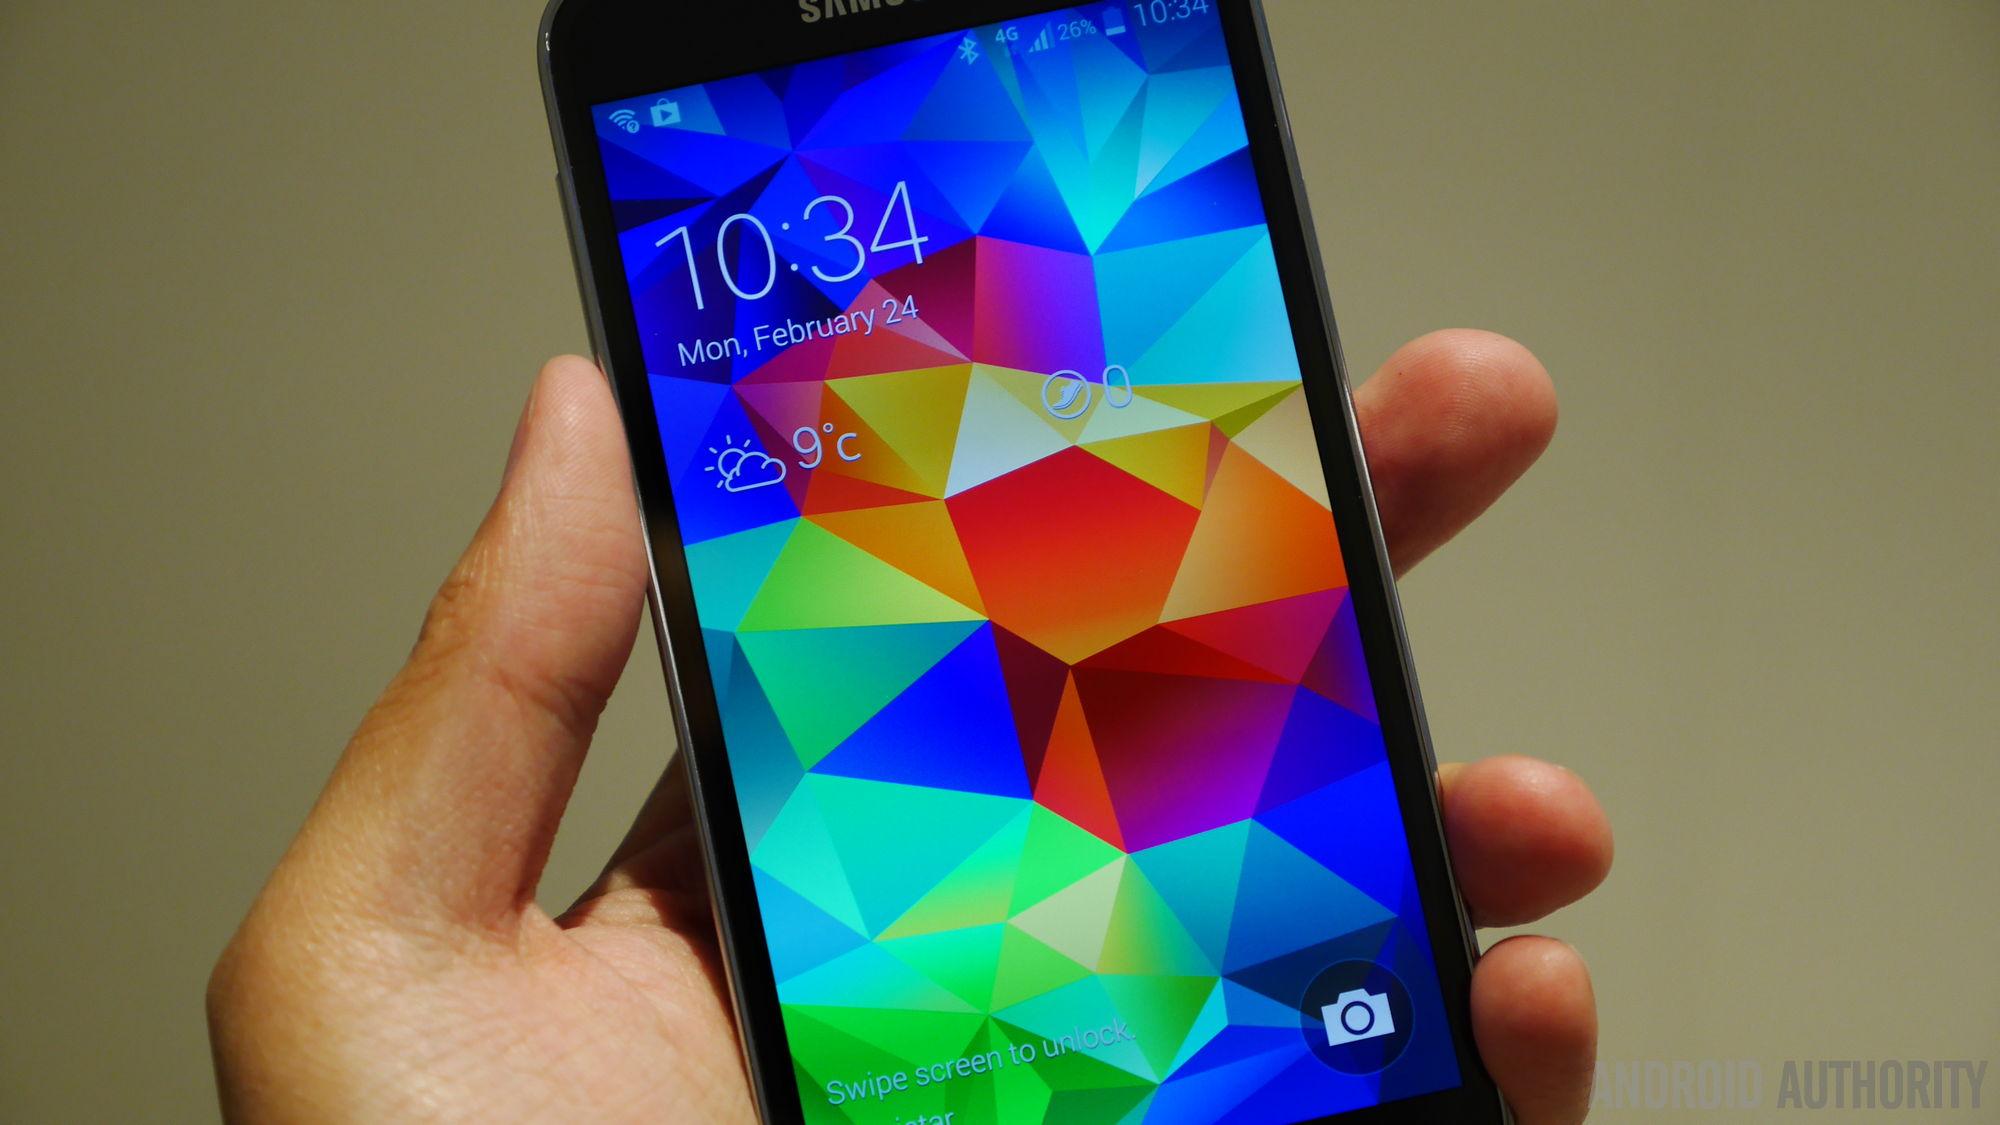 Samsung galaxy s5 unveiled - Samsung Galaxy S5 Unveiled 43